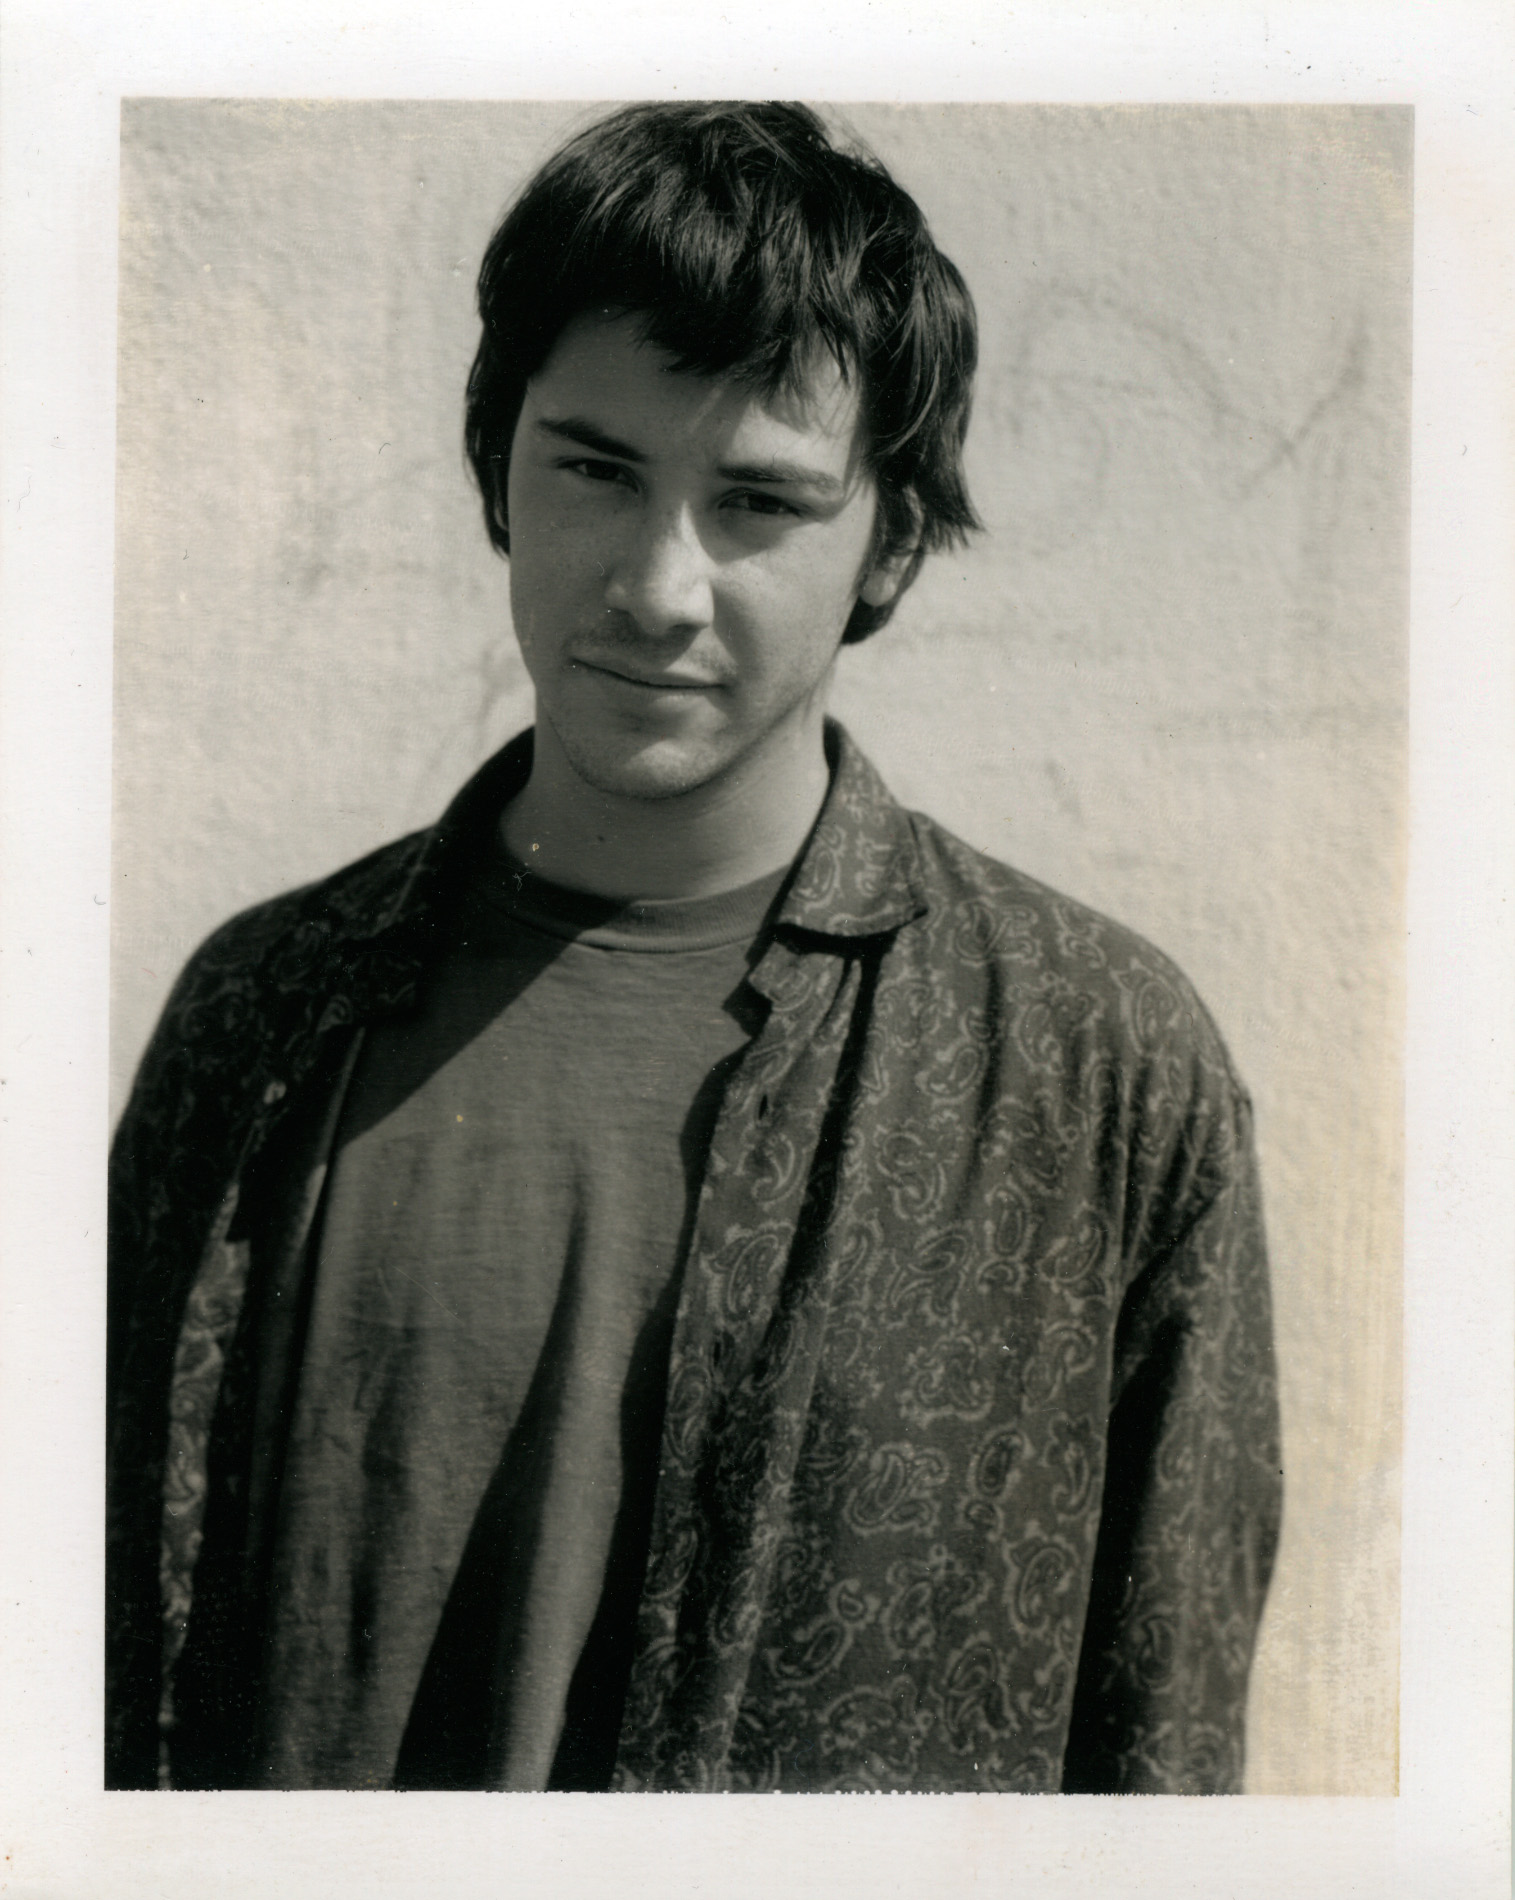 Gus Van Sant_Keanu Reeves_de la série Polaroids, 1983-1999 © Gus Van Sant